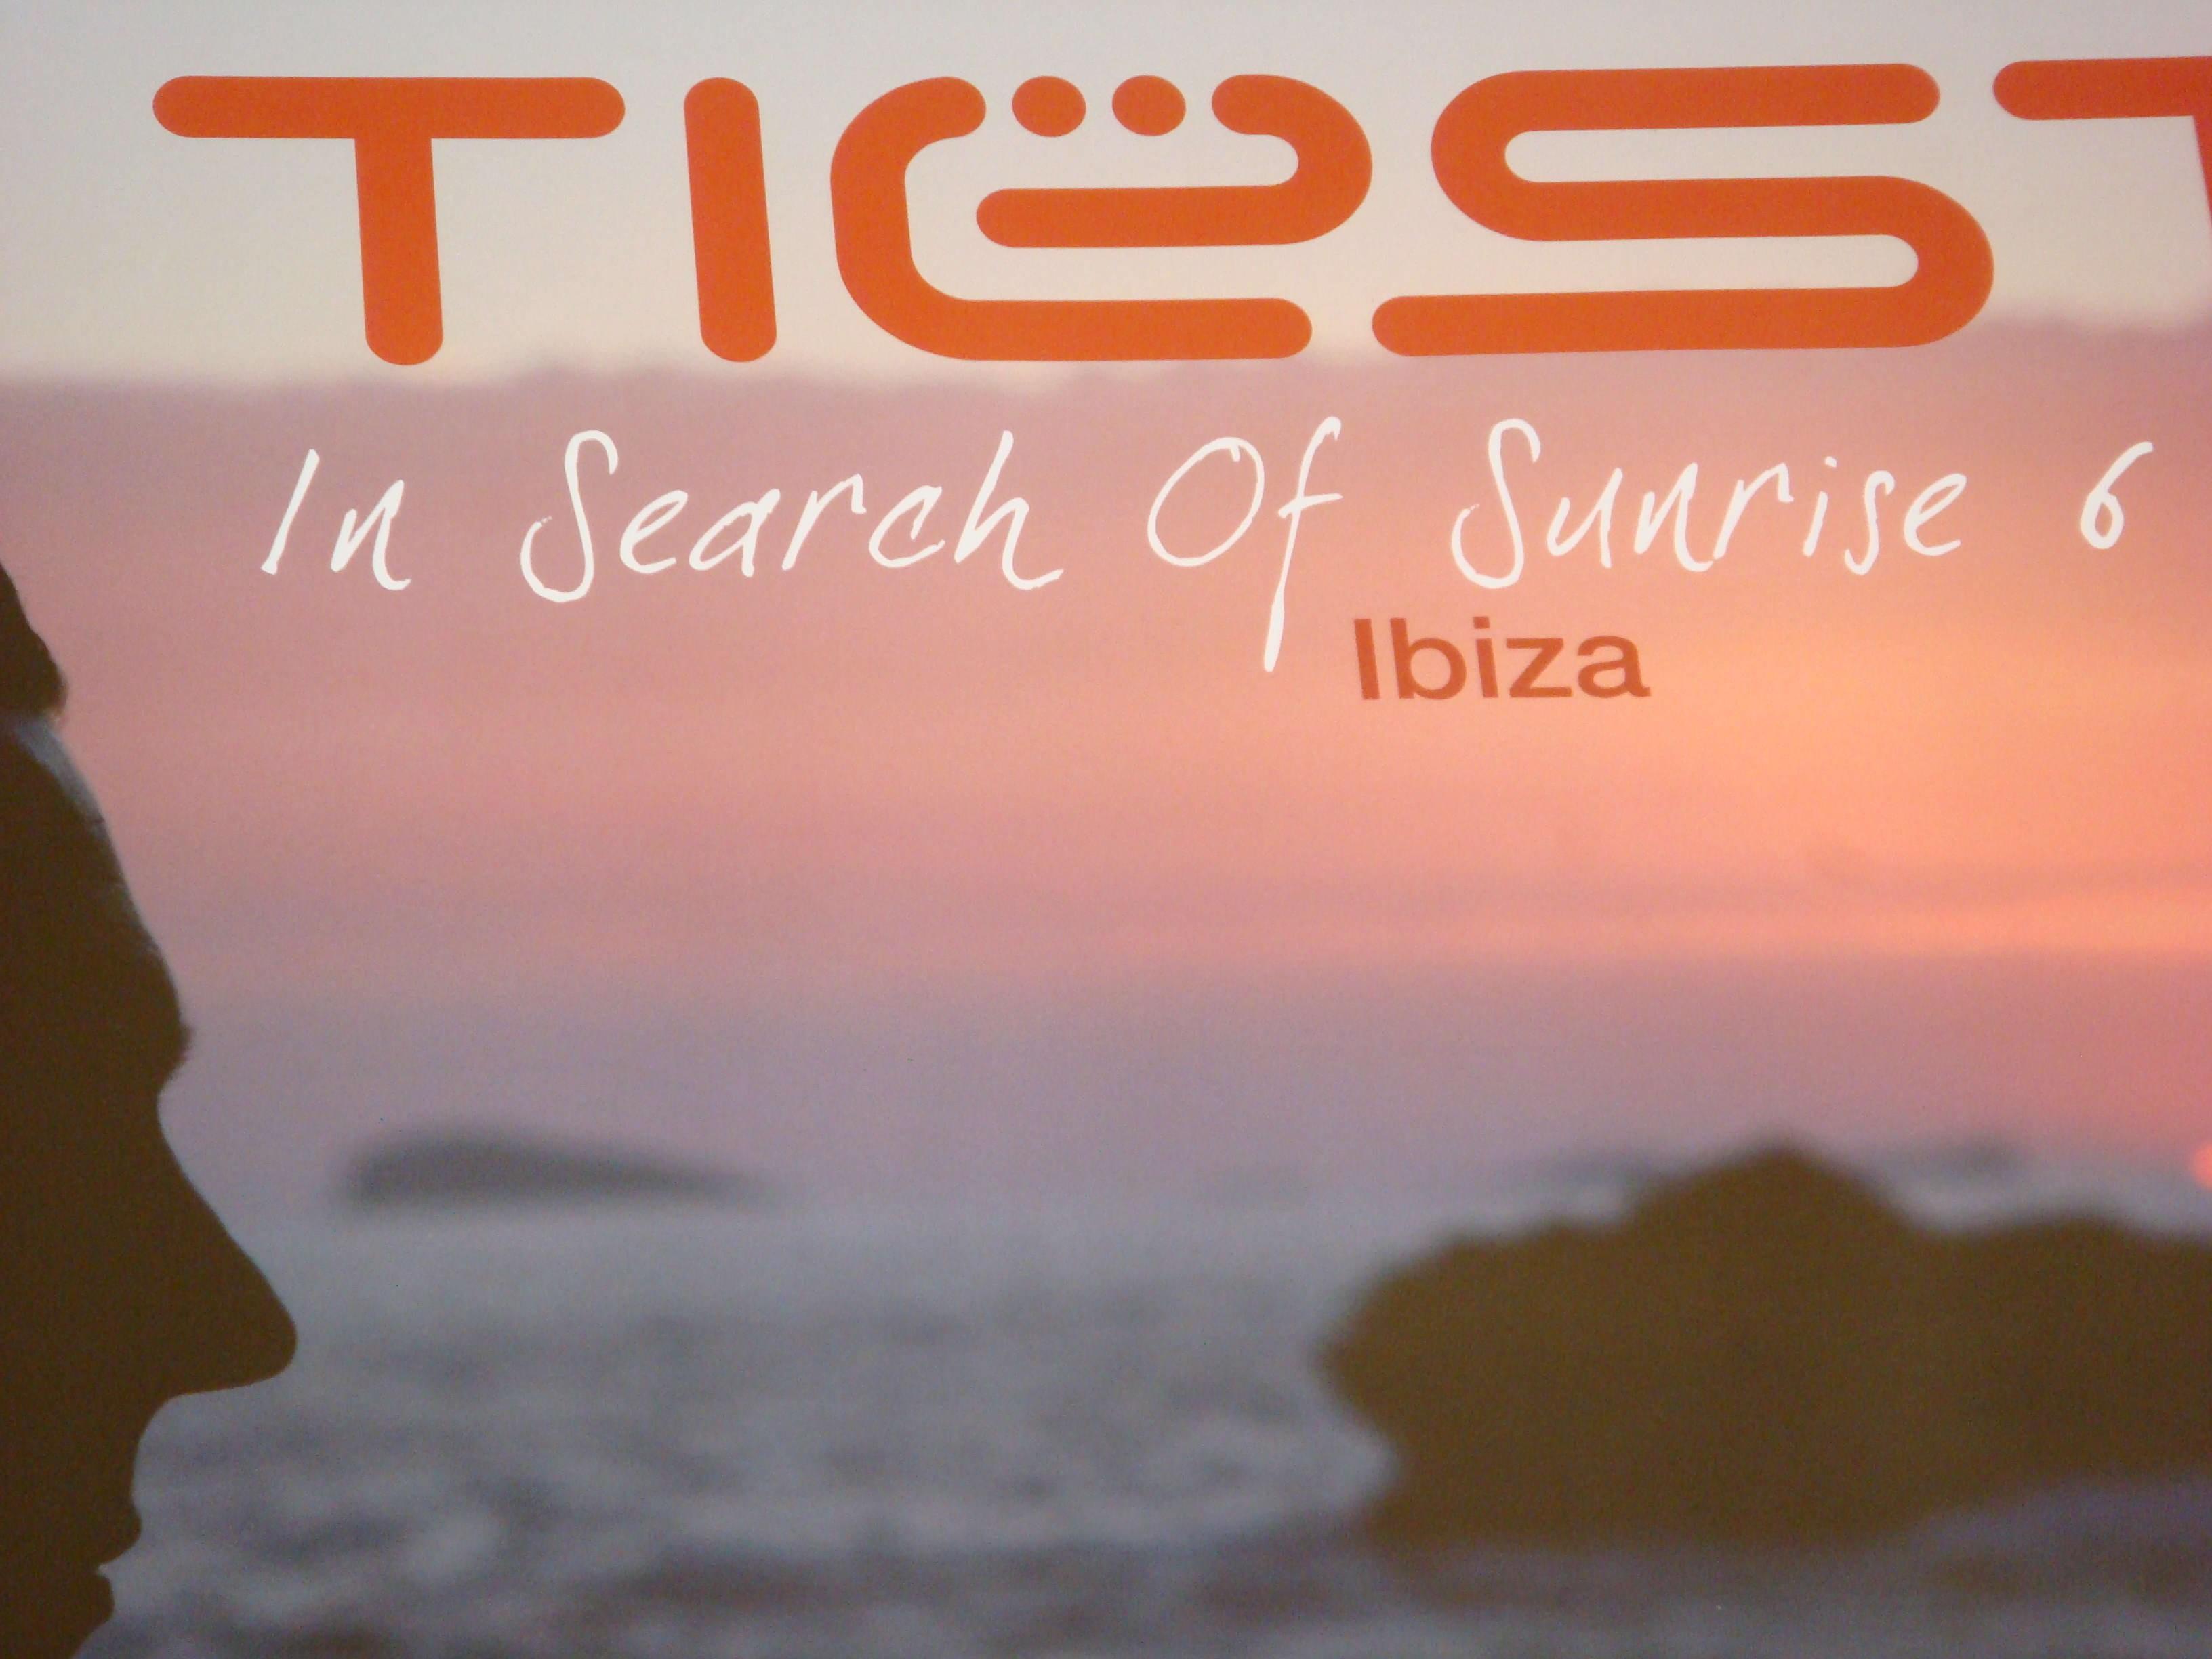 Dj Tiesto In Search Of Sunrise 6 Release Poster